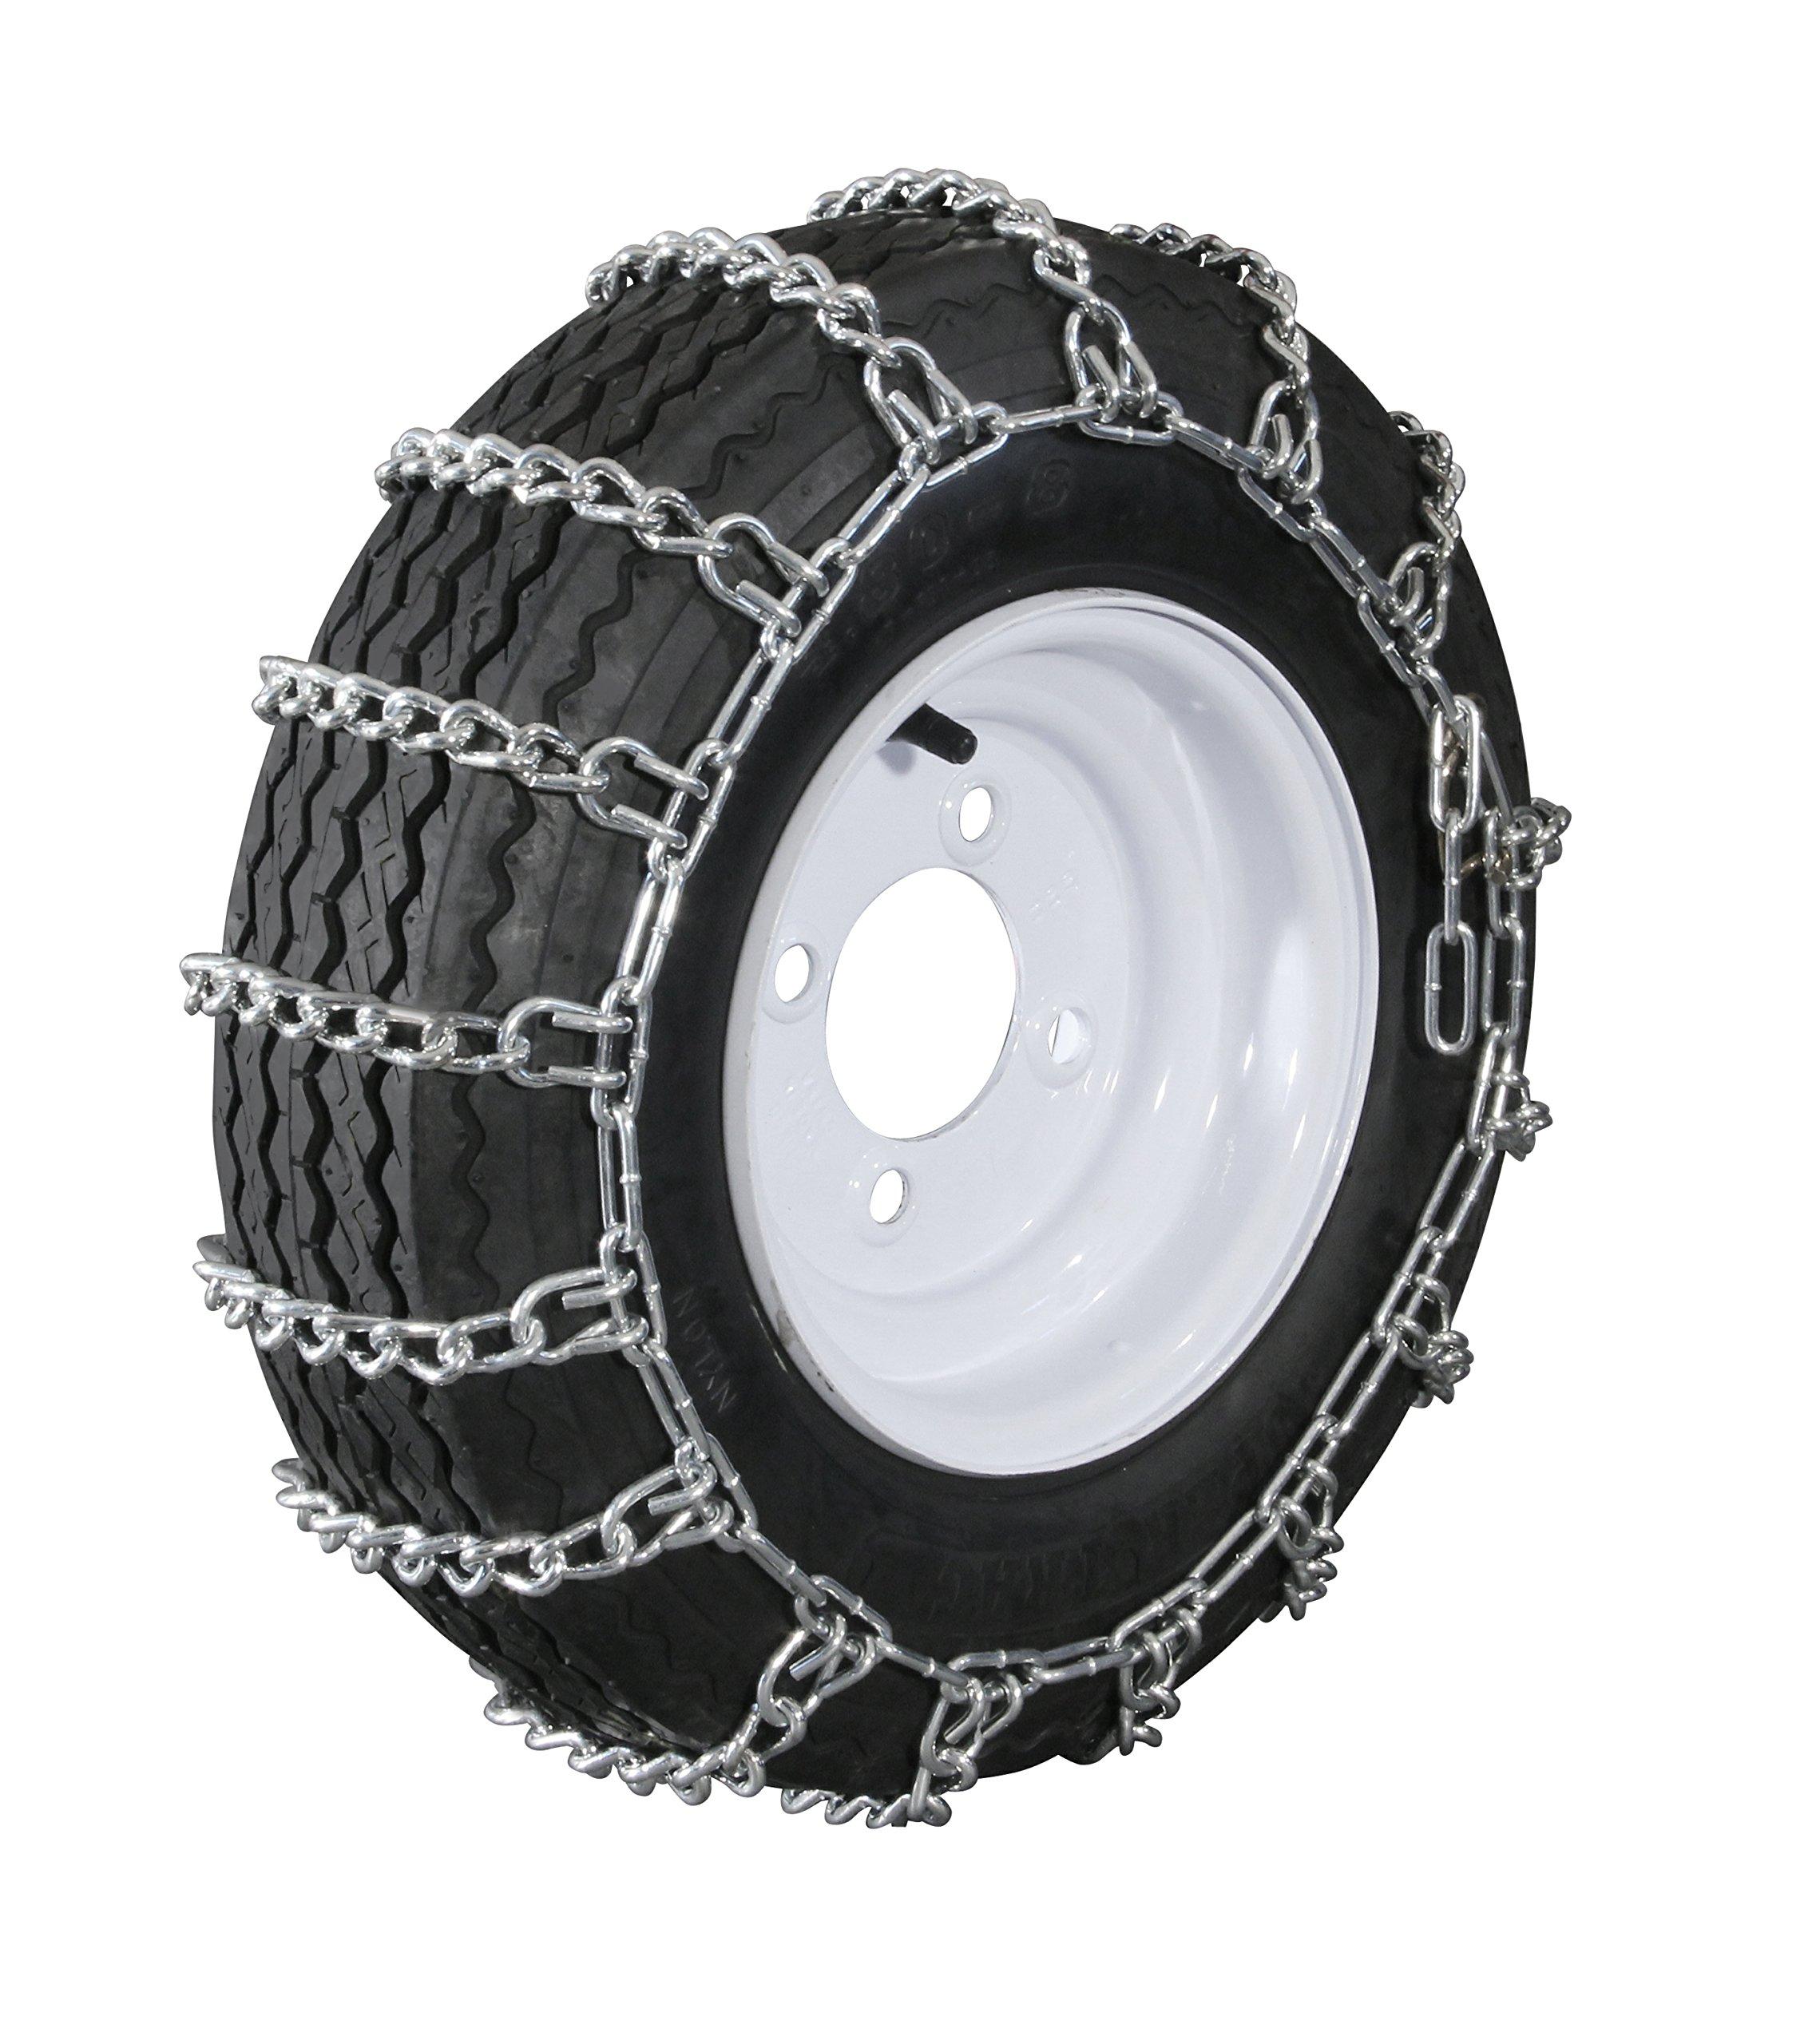 The ROP Shop New Pair 2 Link TIRE Chains 15x6x6 15x5x6 14x5.50x5 for UTV ATV Peerless MaxTrac